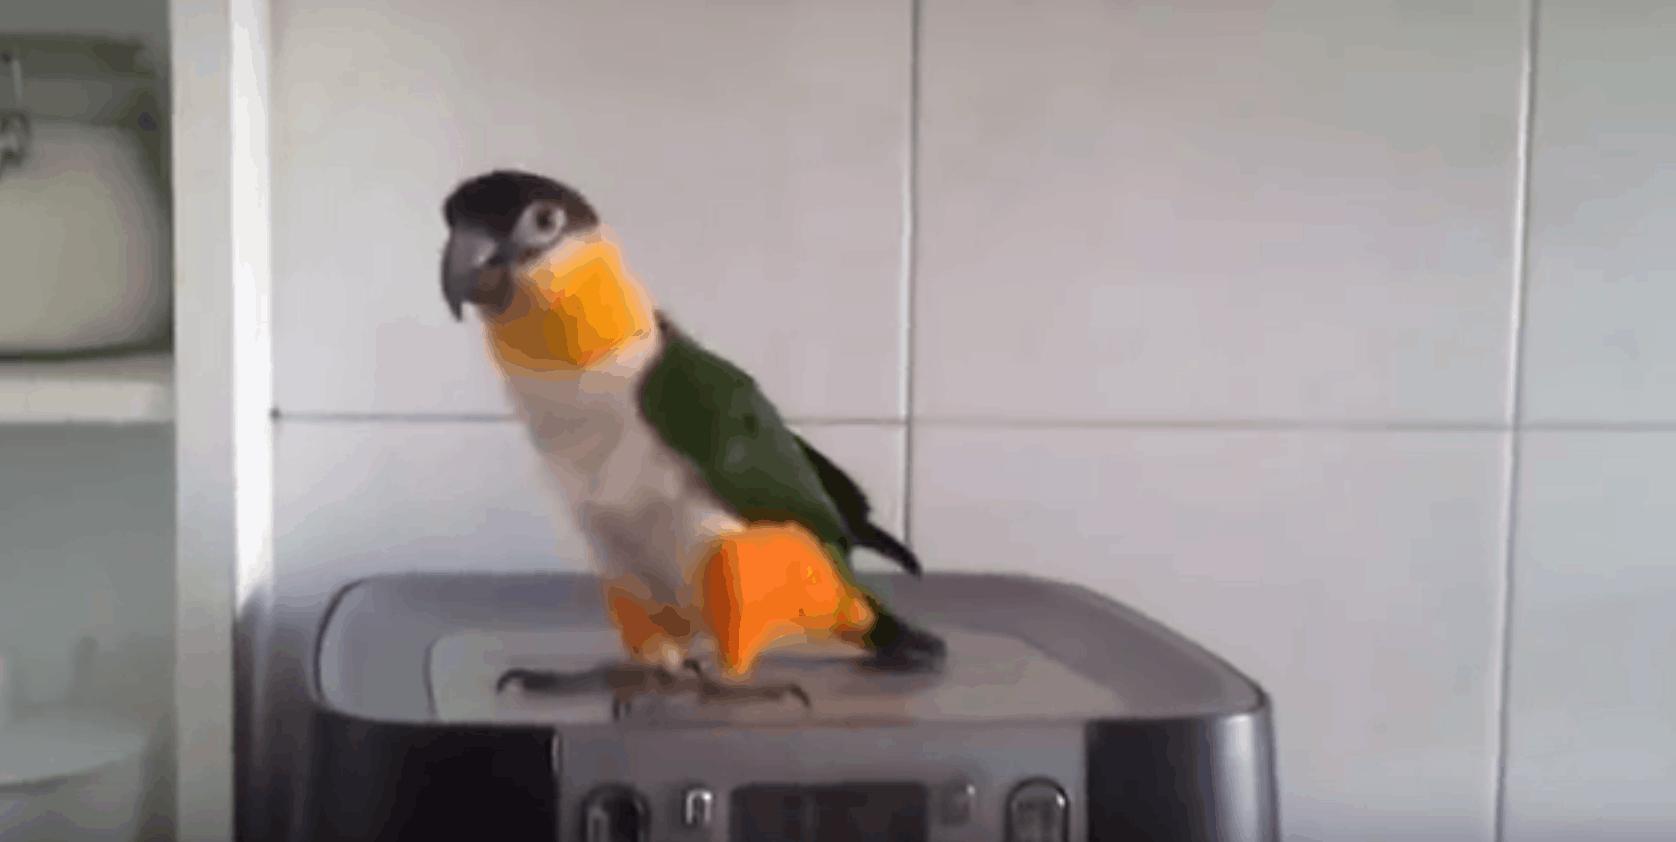 The Dancing Irish Parrot